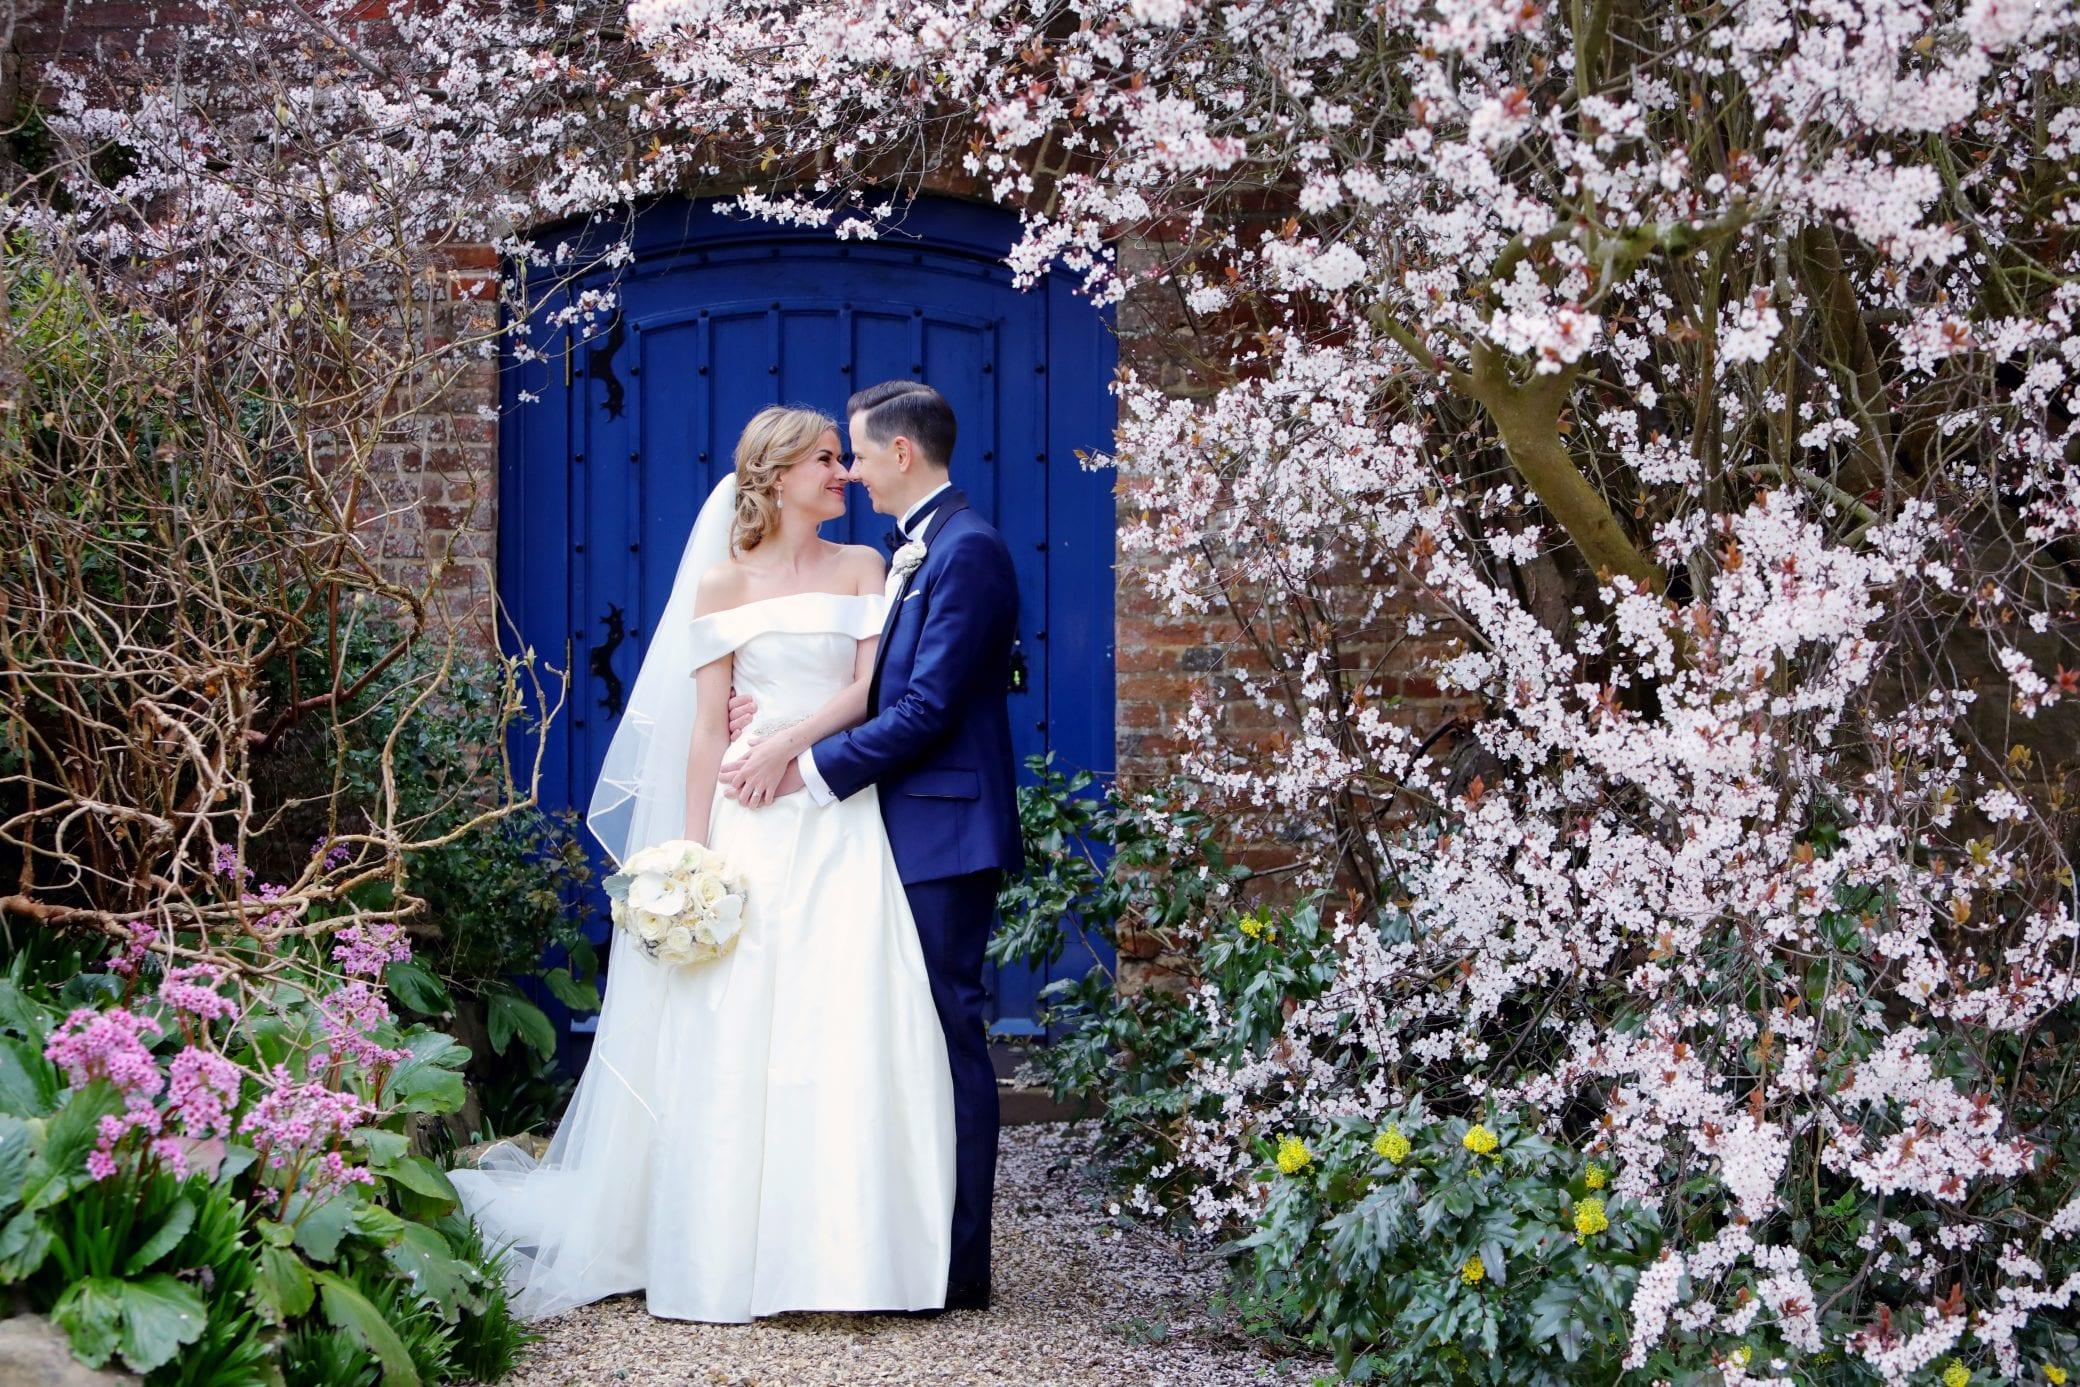 Romantic wedding photography in Farnham